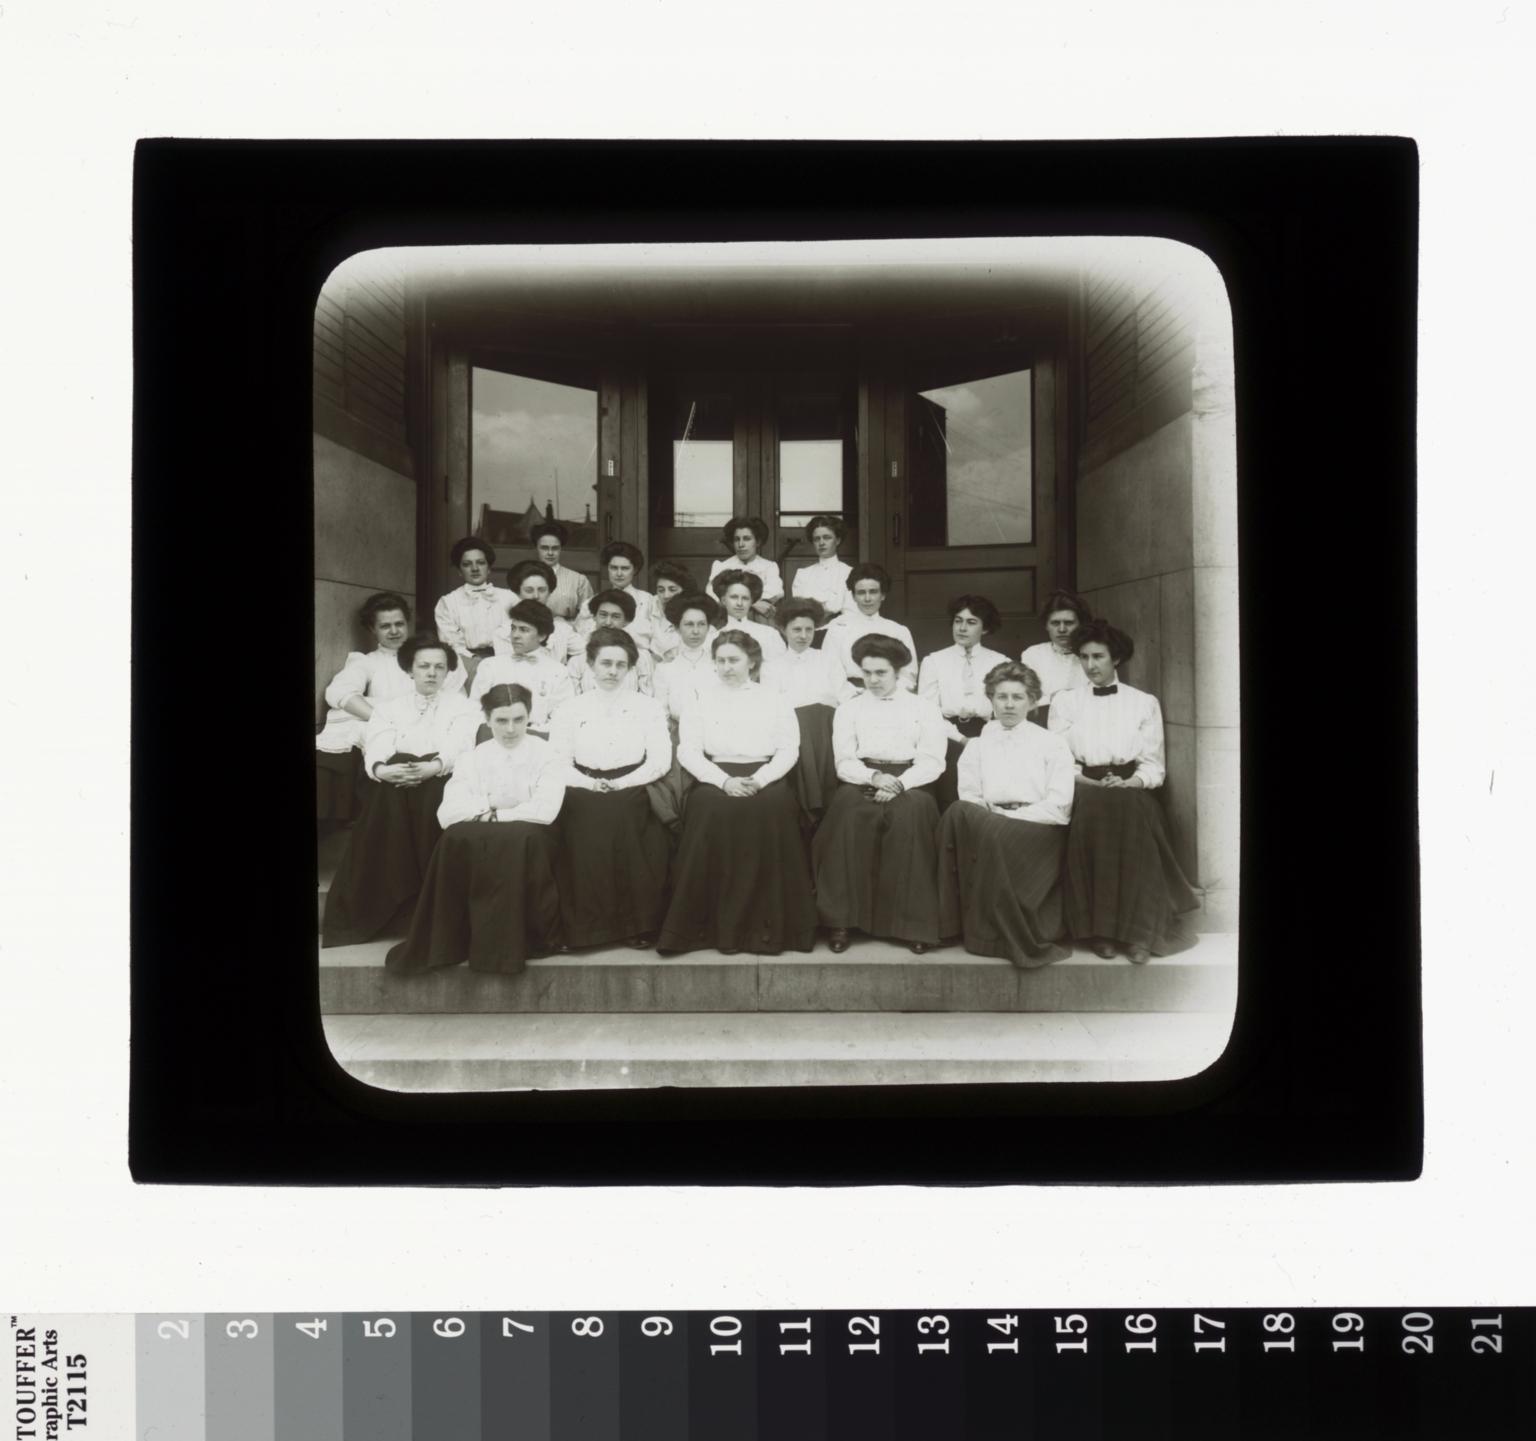 Group portrait, students, Rochester Athenaeum and Mechanics Institute